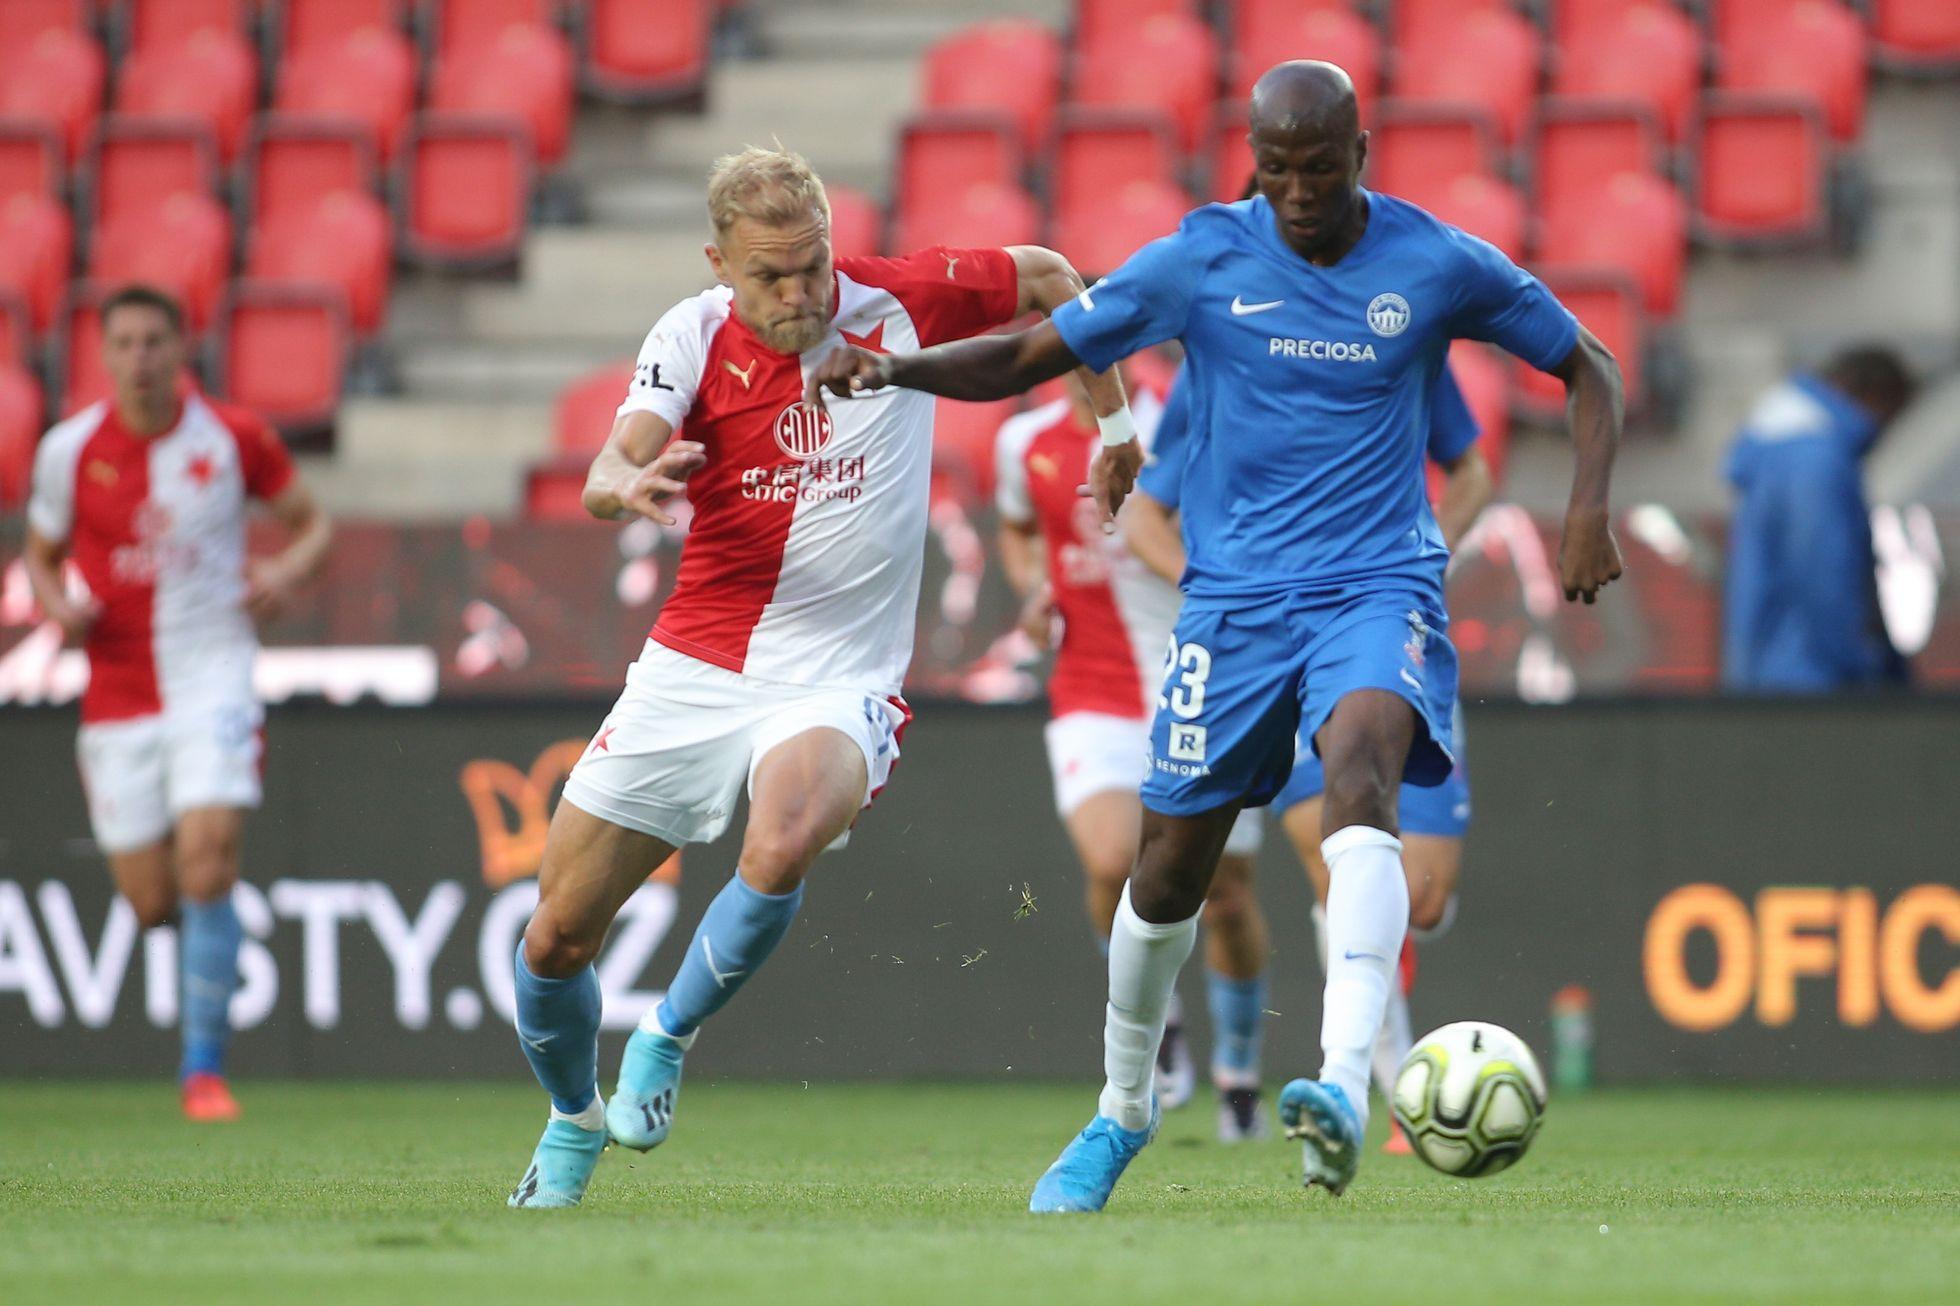 Liberec vs Slavia. Slavia hraje na horké liberecké půdě, Škoda s Traorem v základu